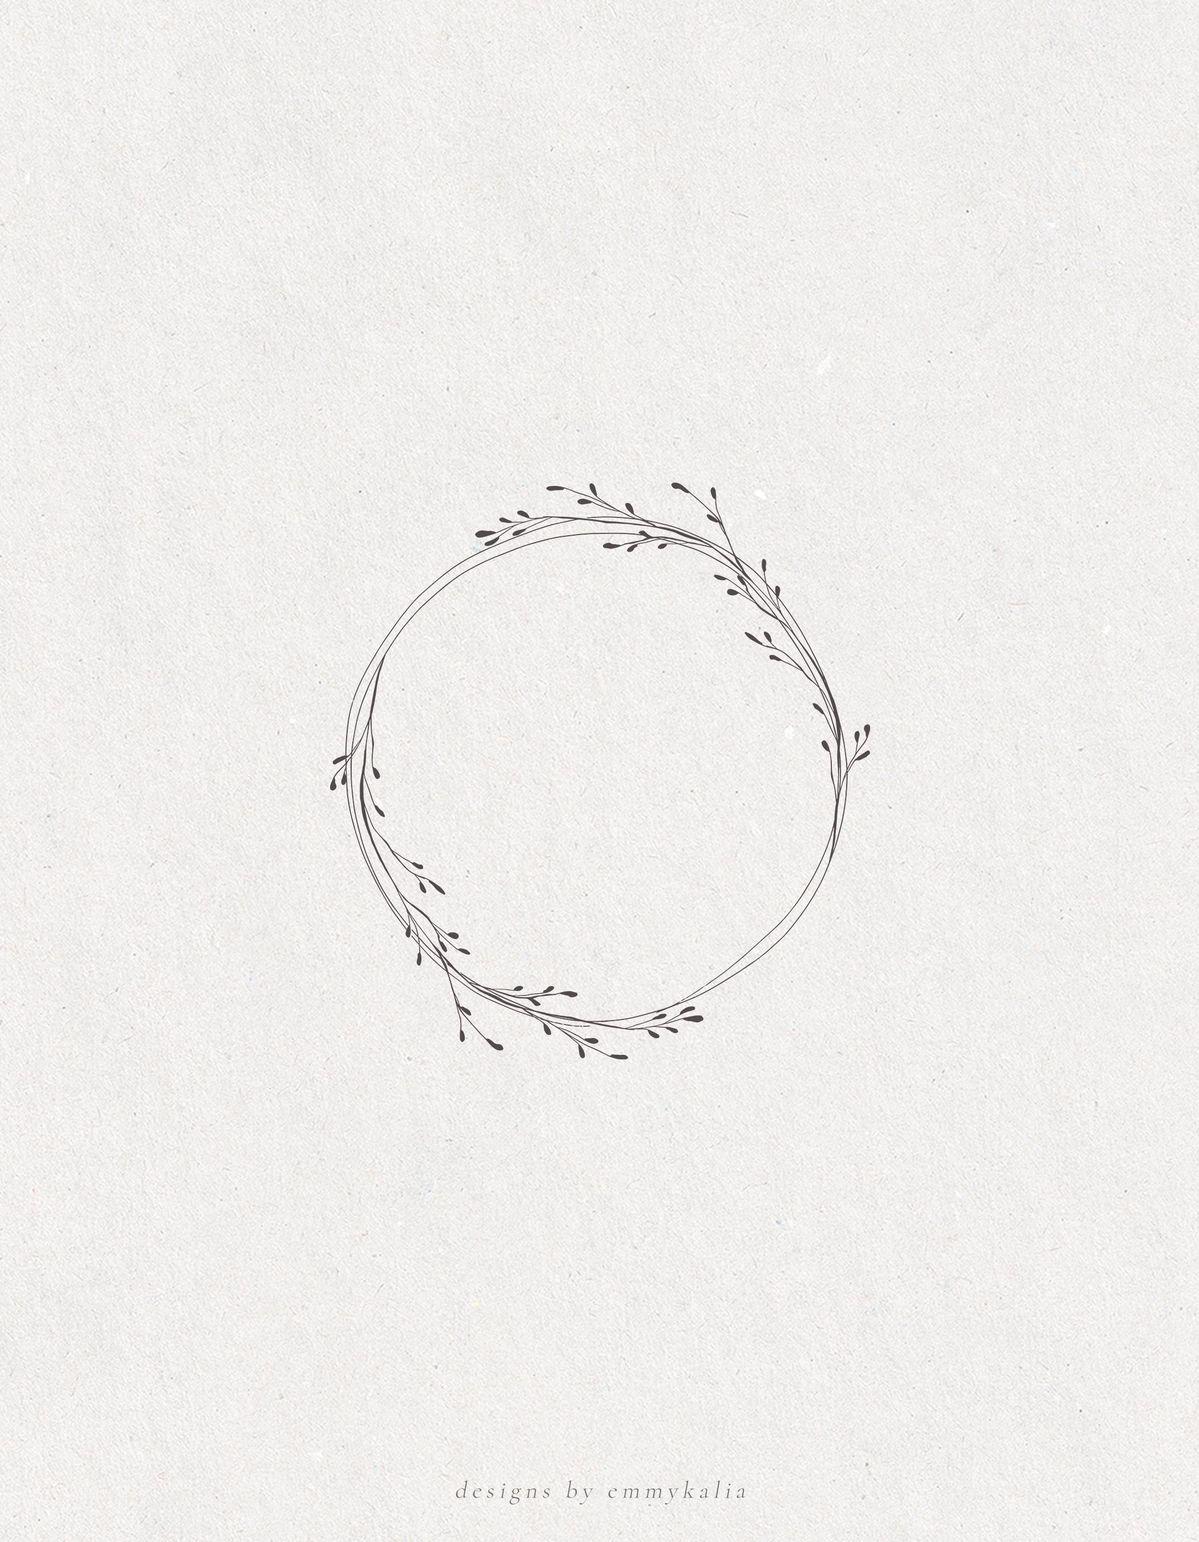 Botanische Kranz Hand skizziert Clip Art Illustration, Vektor & Png transparenten Hinterg...